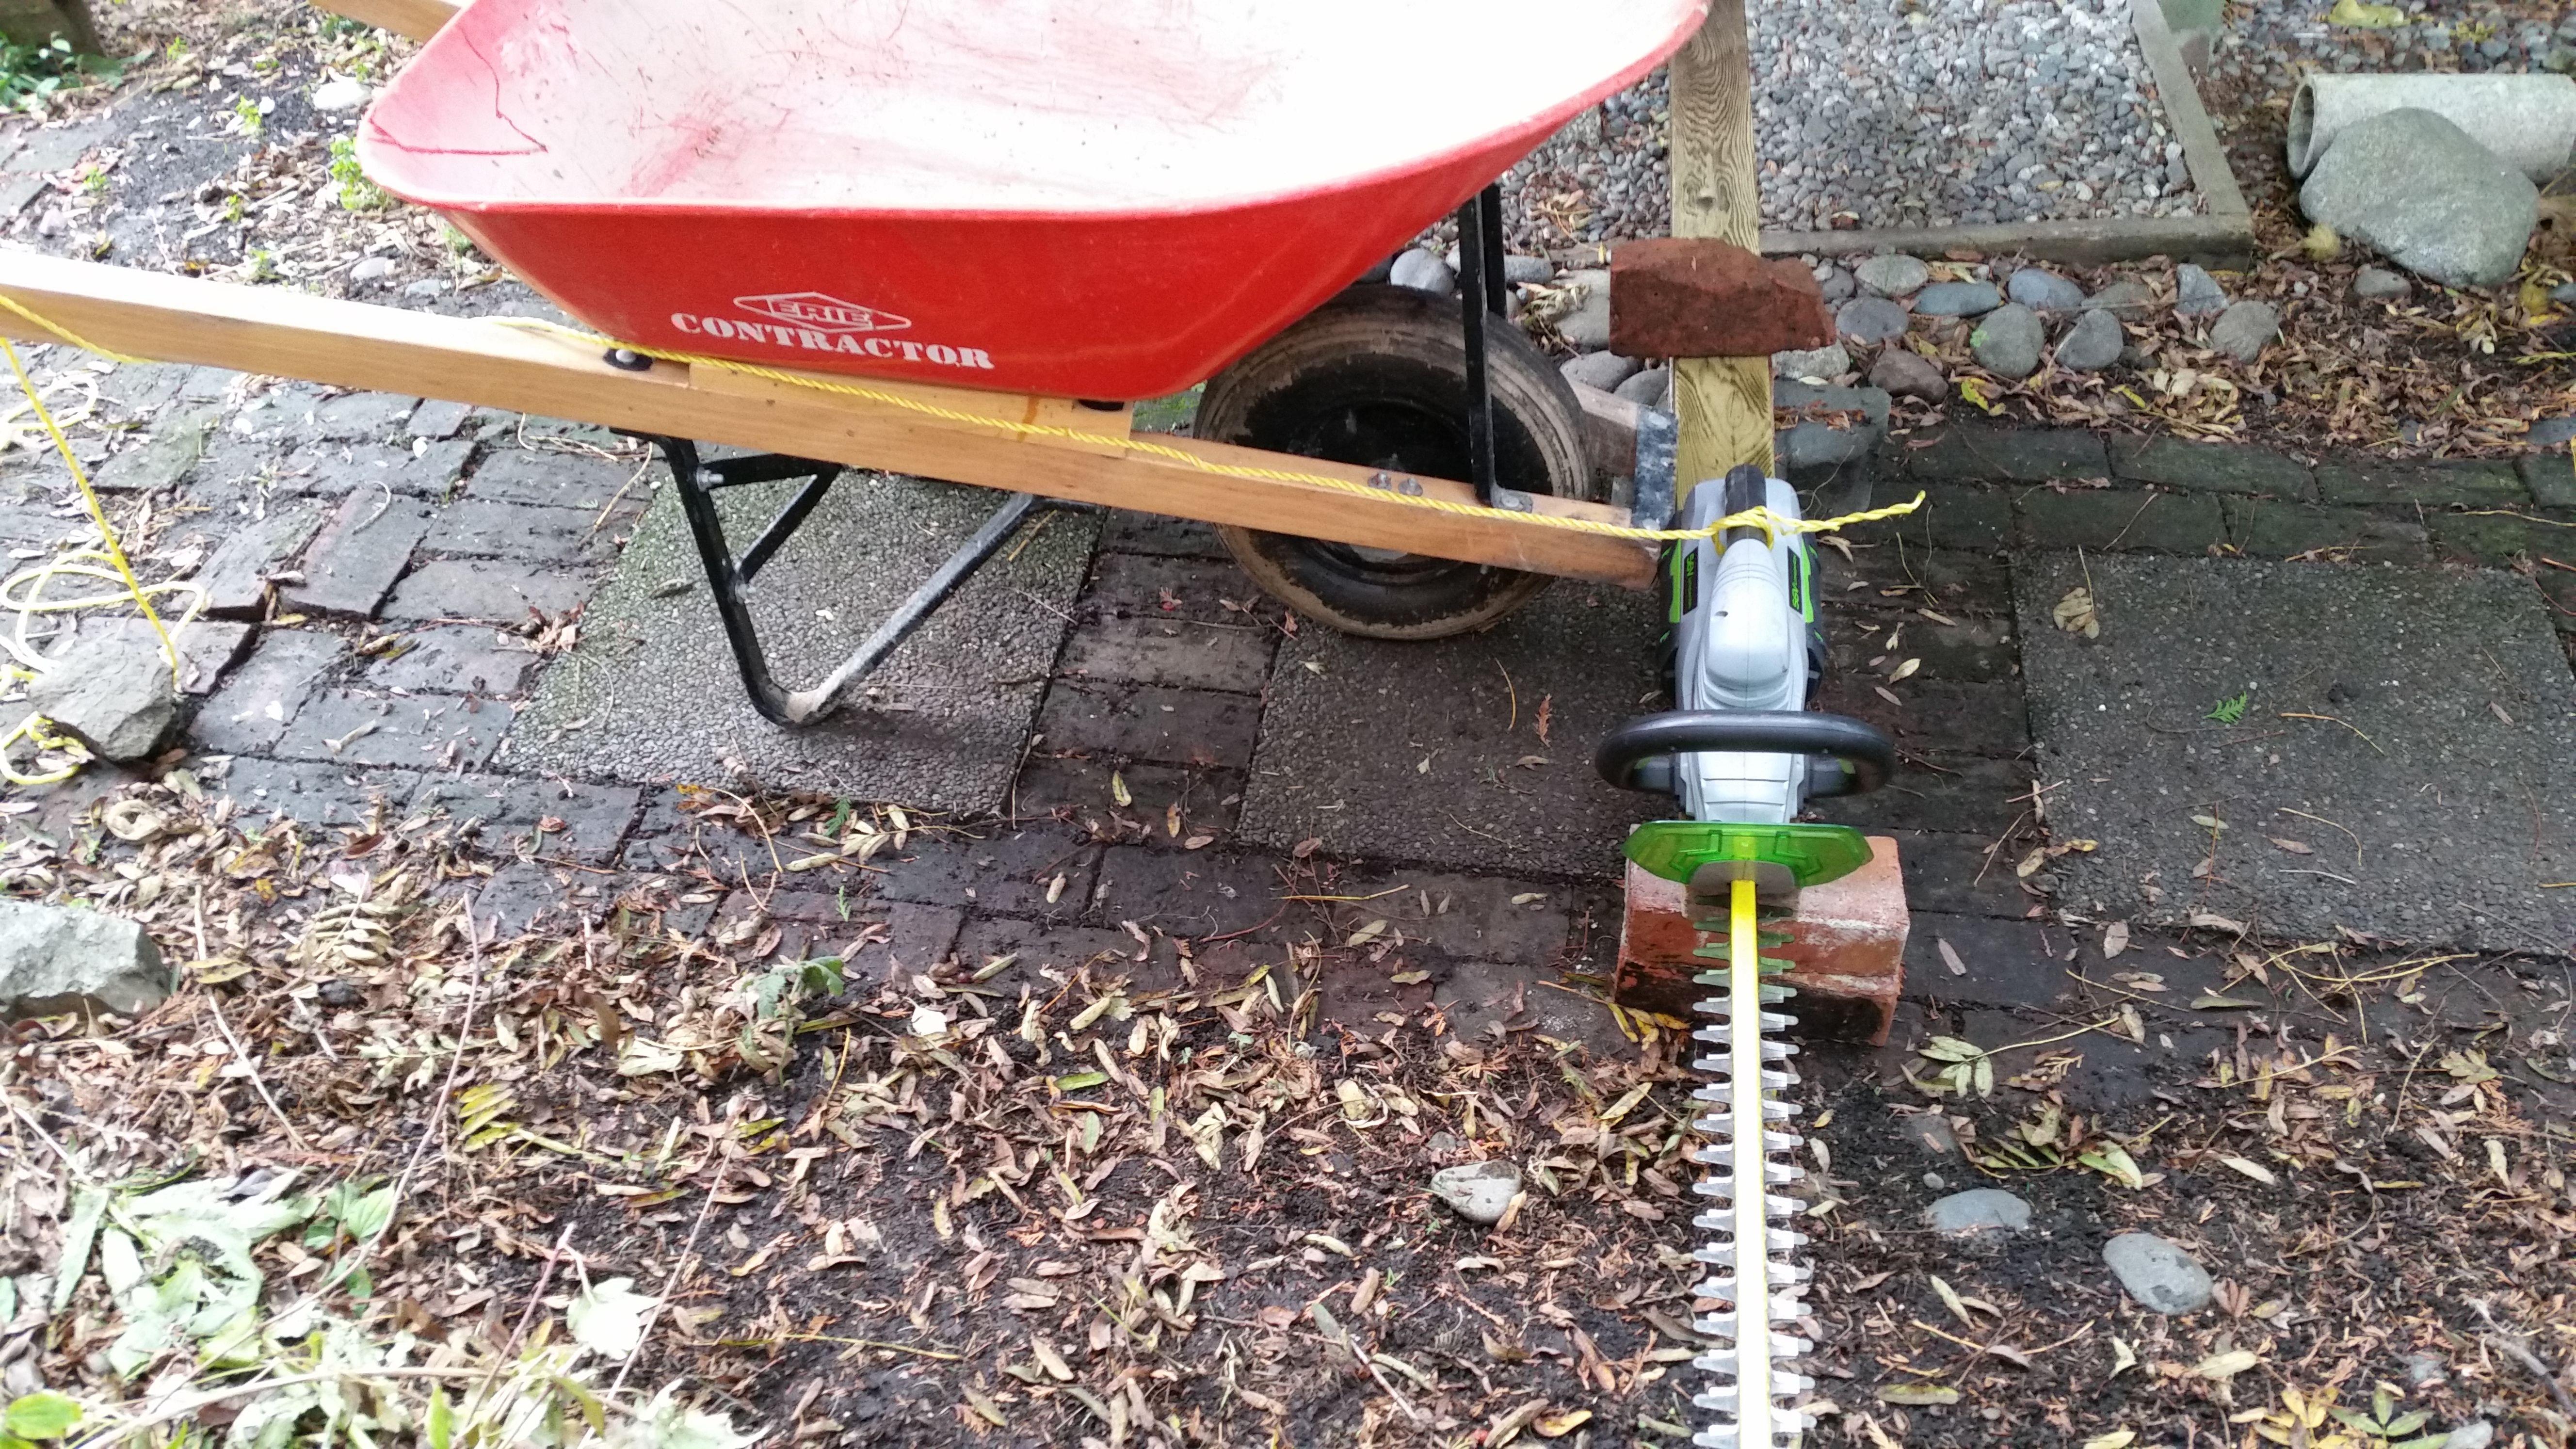 Diy Wheelbarrow Sickle Bar Mower Homemade Gas And Electric Hedge Cutter Useful Life Hacks Sickle